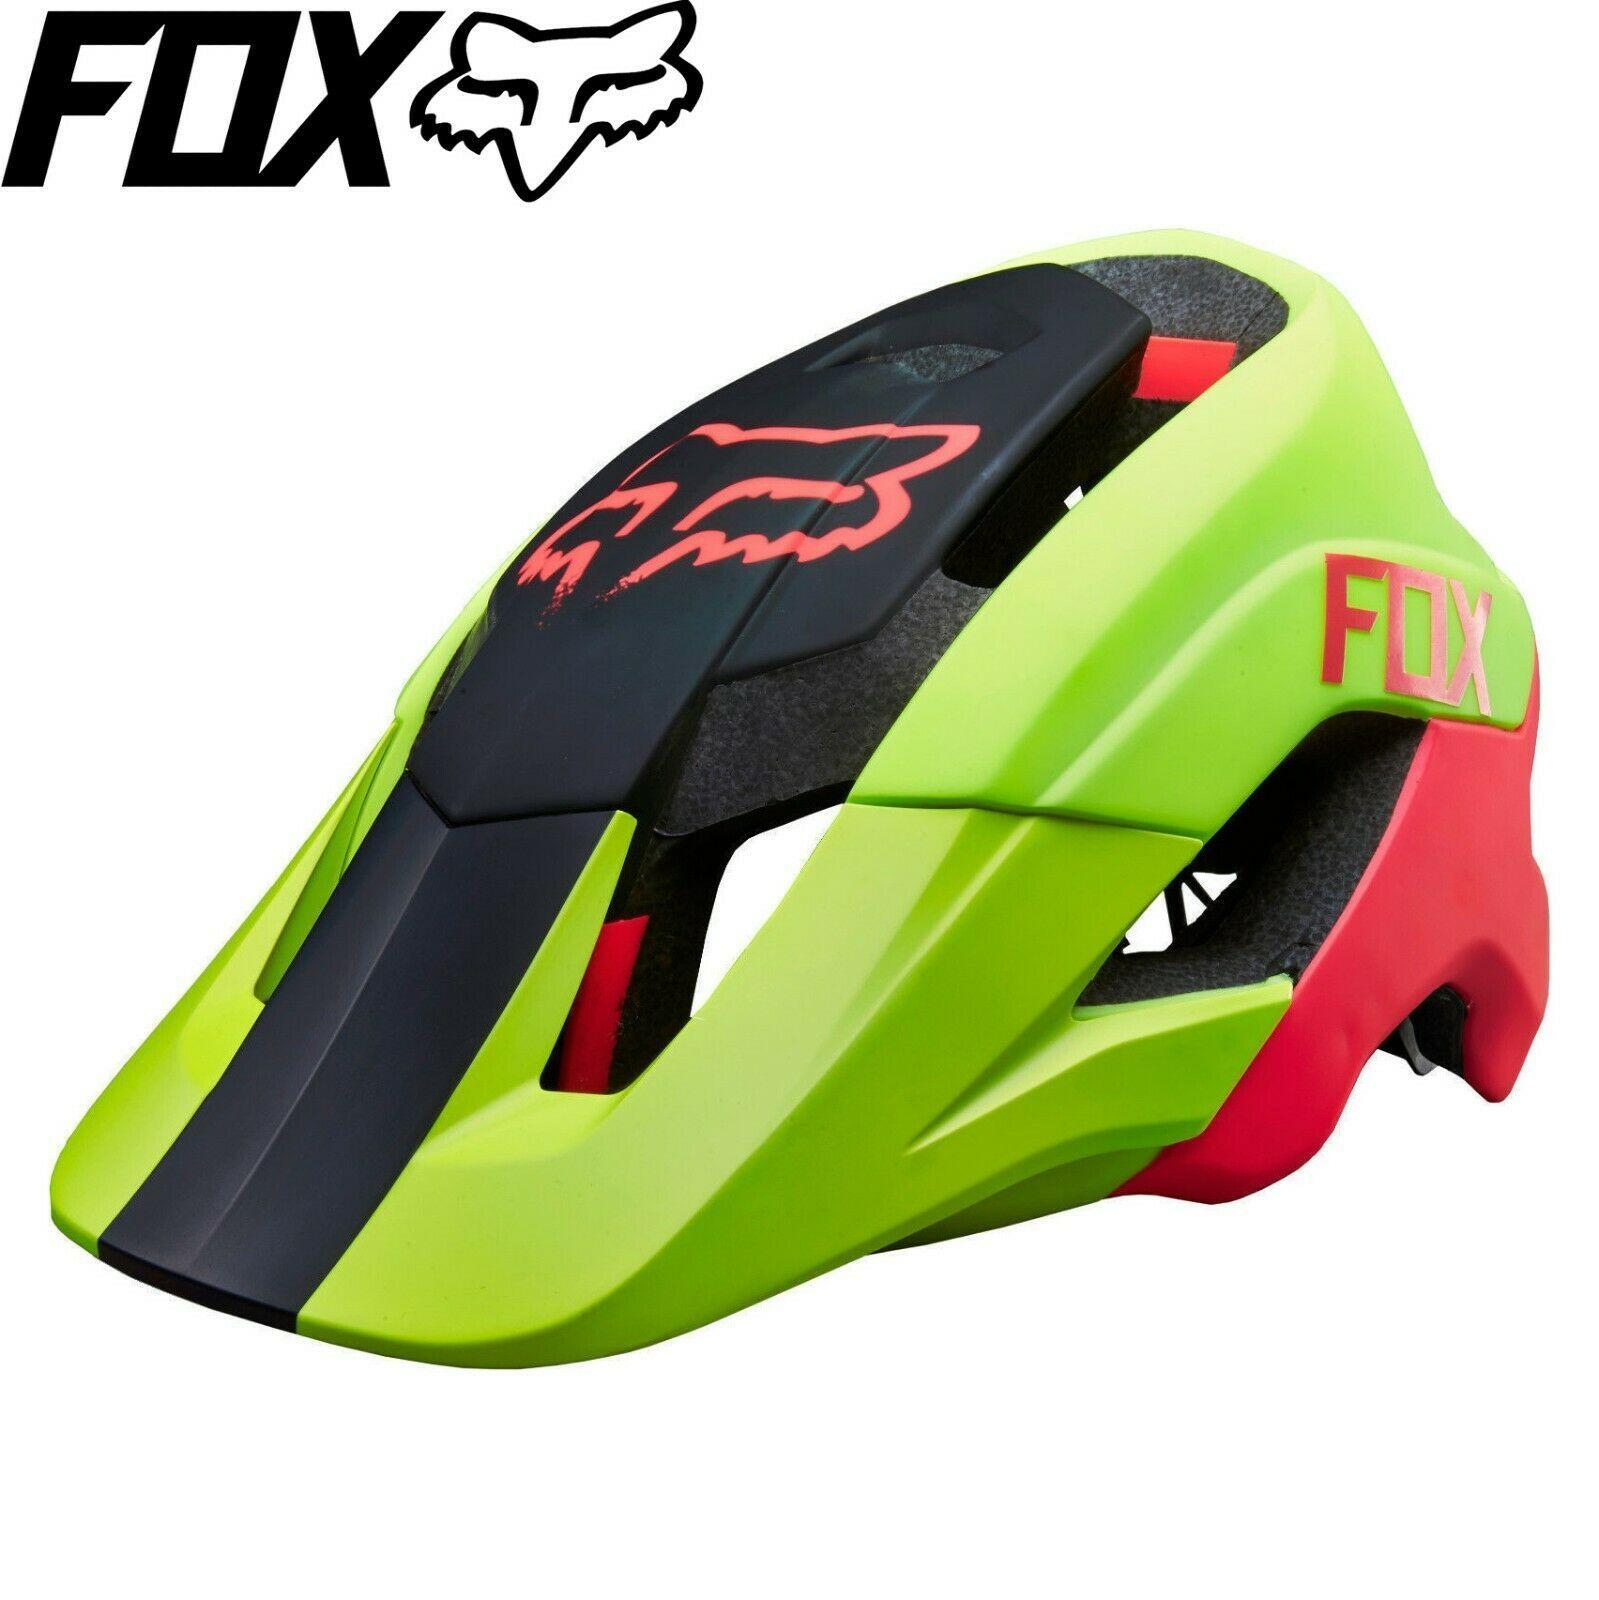 Fox Metah Graphics Mtb Bike Helmet Fluro Yellow Sizes S M L Xl